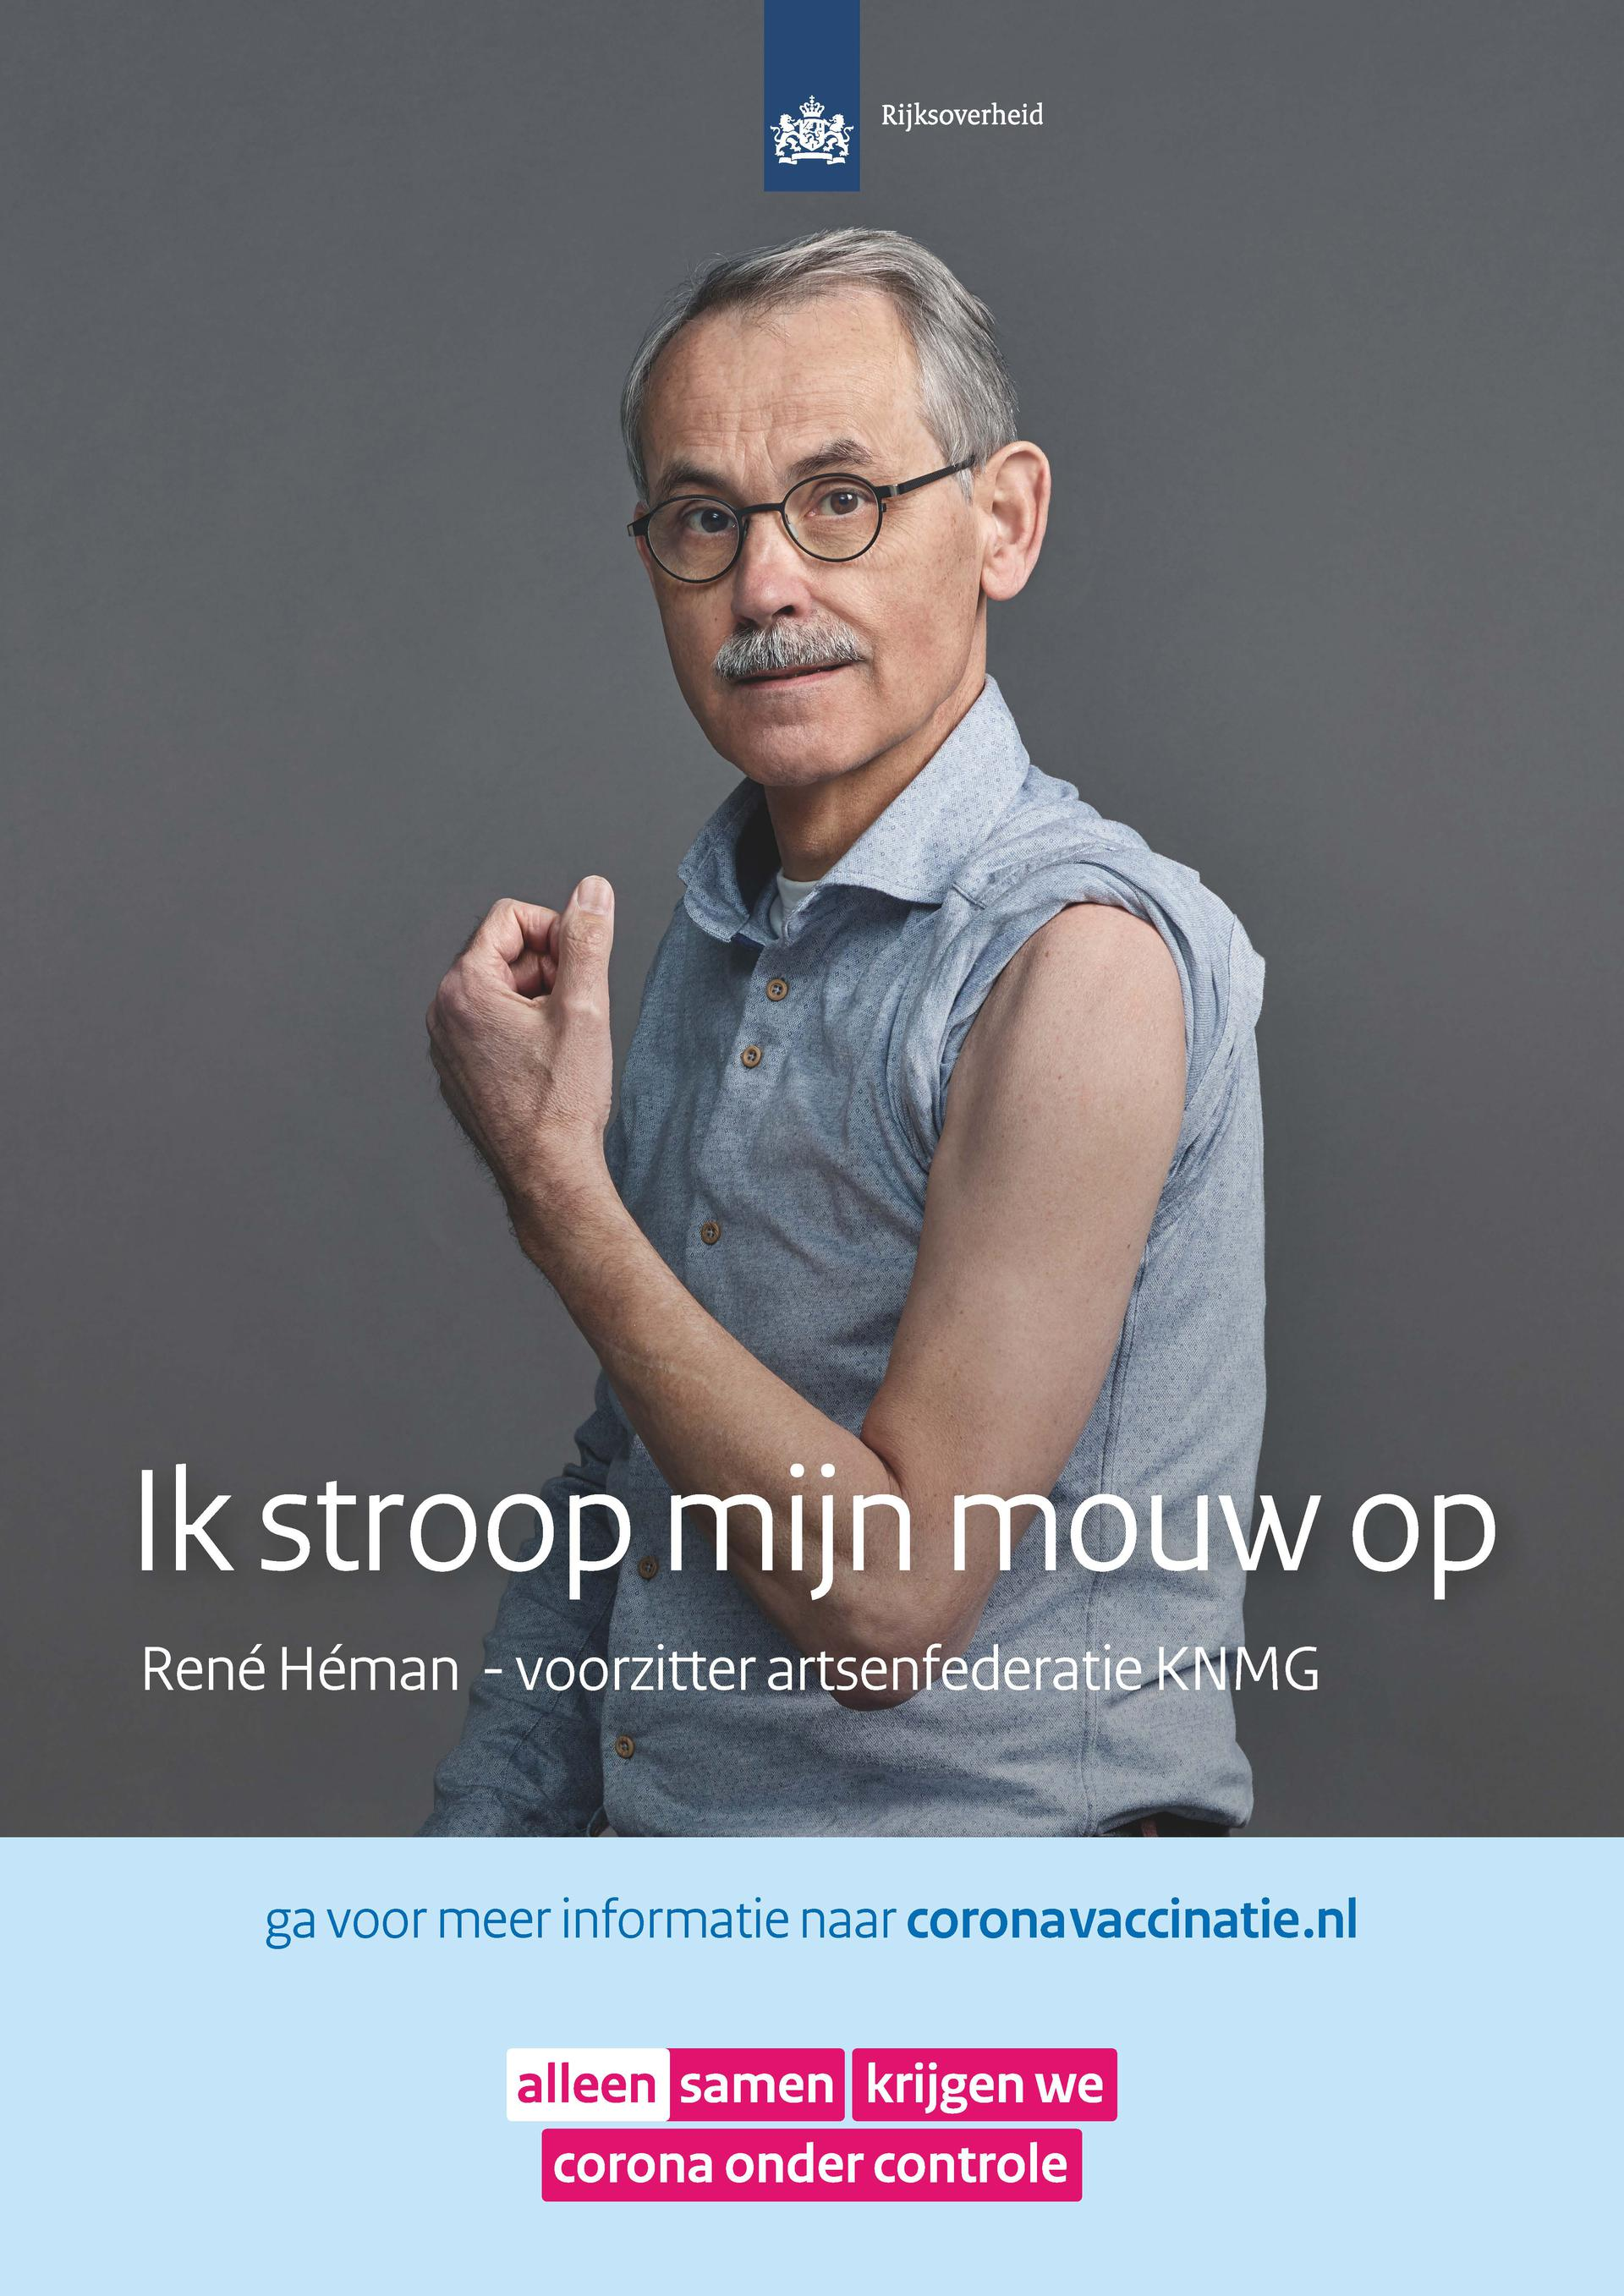 Poster René Héman - voorzitter artsenfederatie KNMG